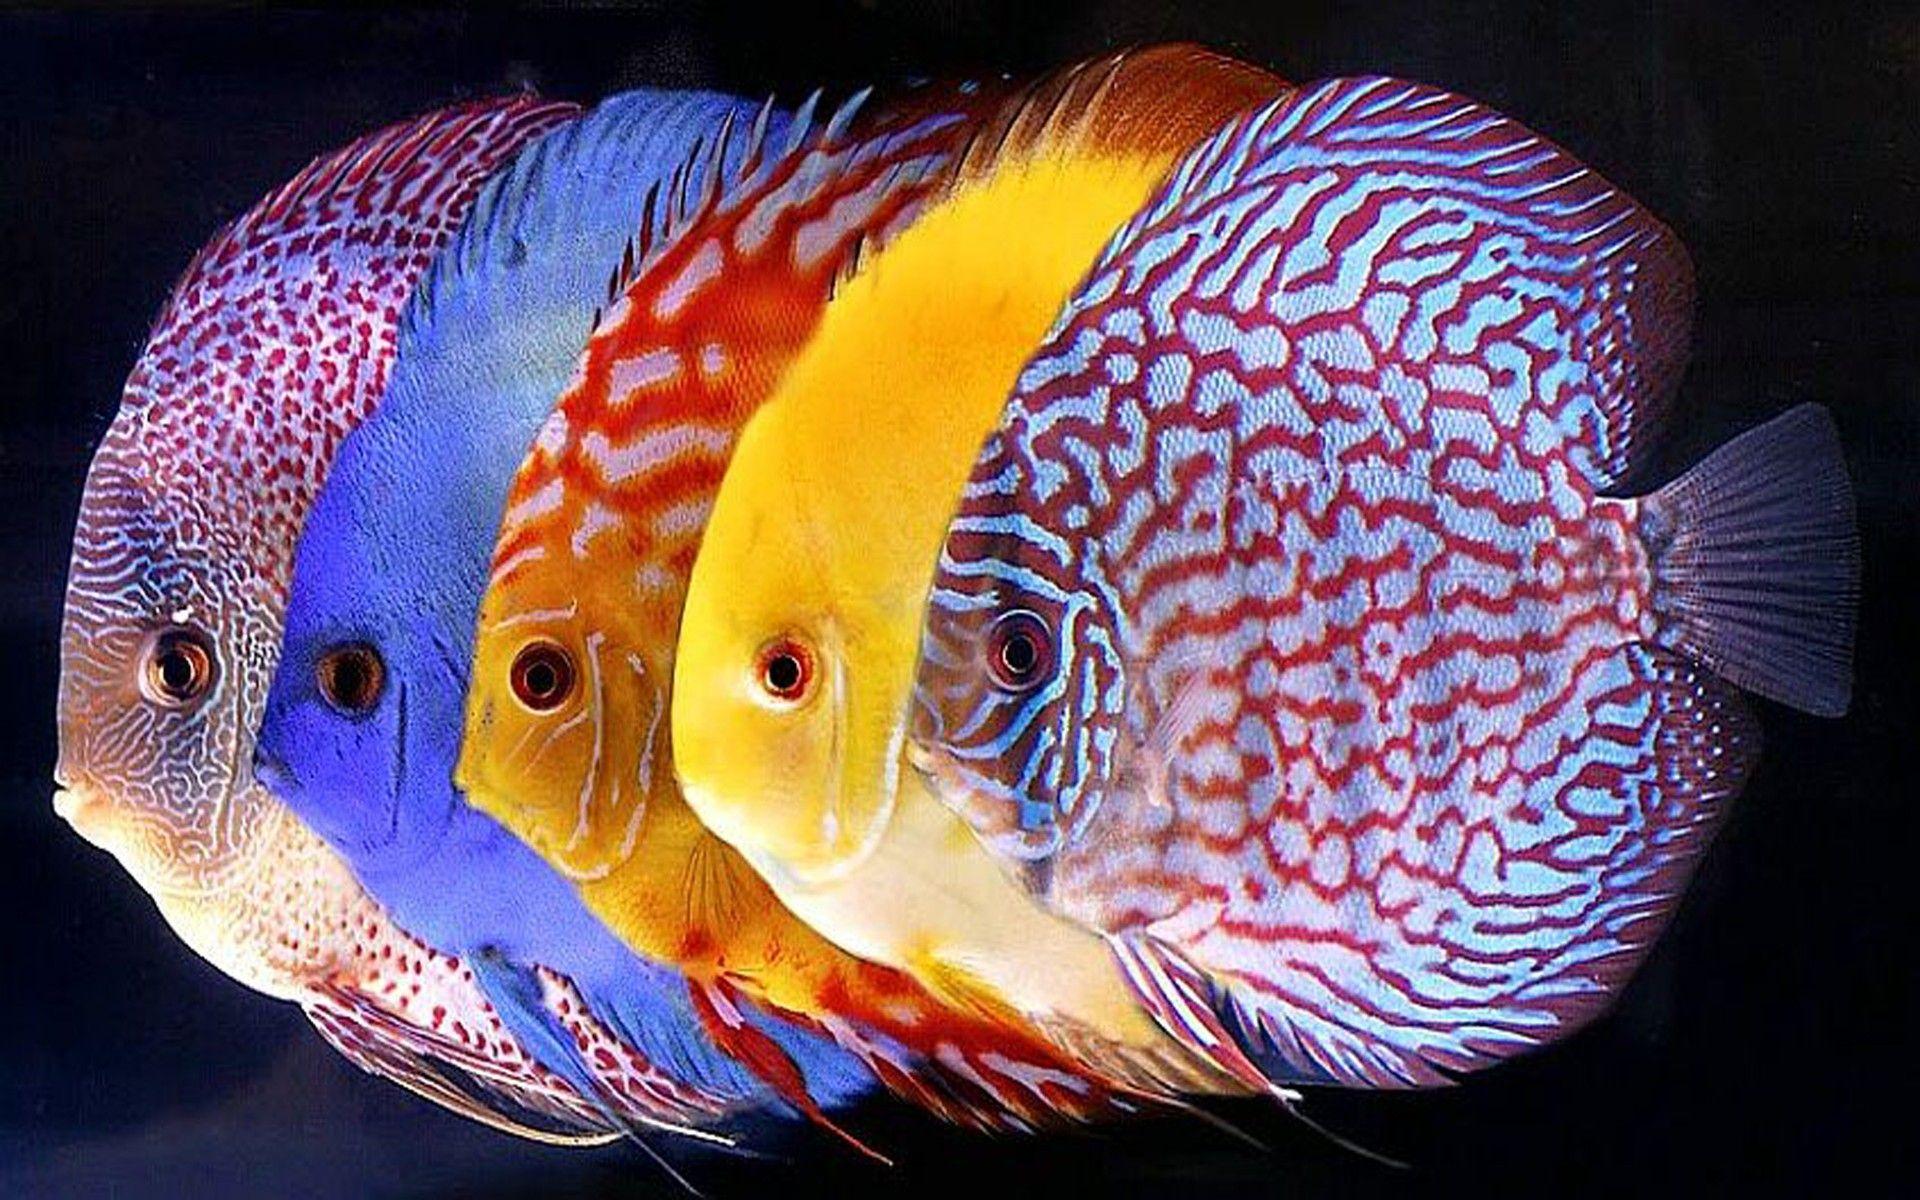 Animal Goldfish Aquarium Fish Wallpaper Fish Wallpaper